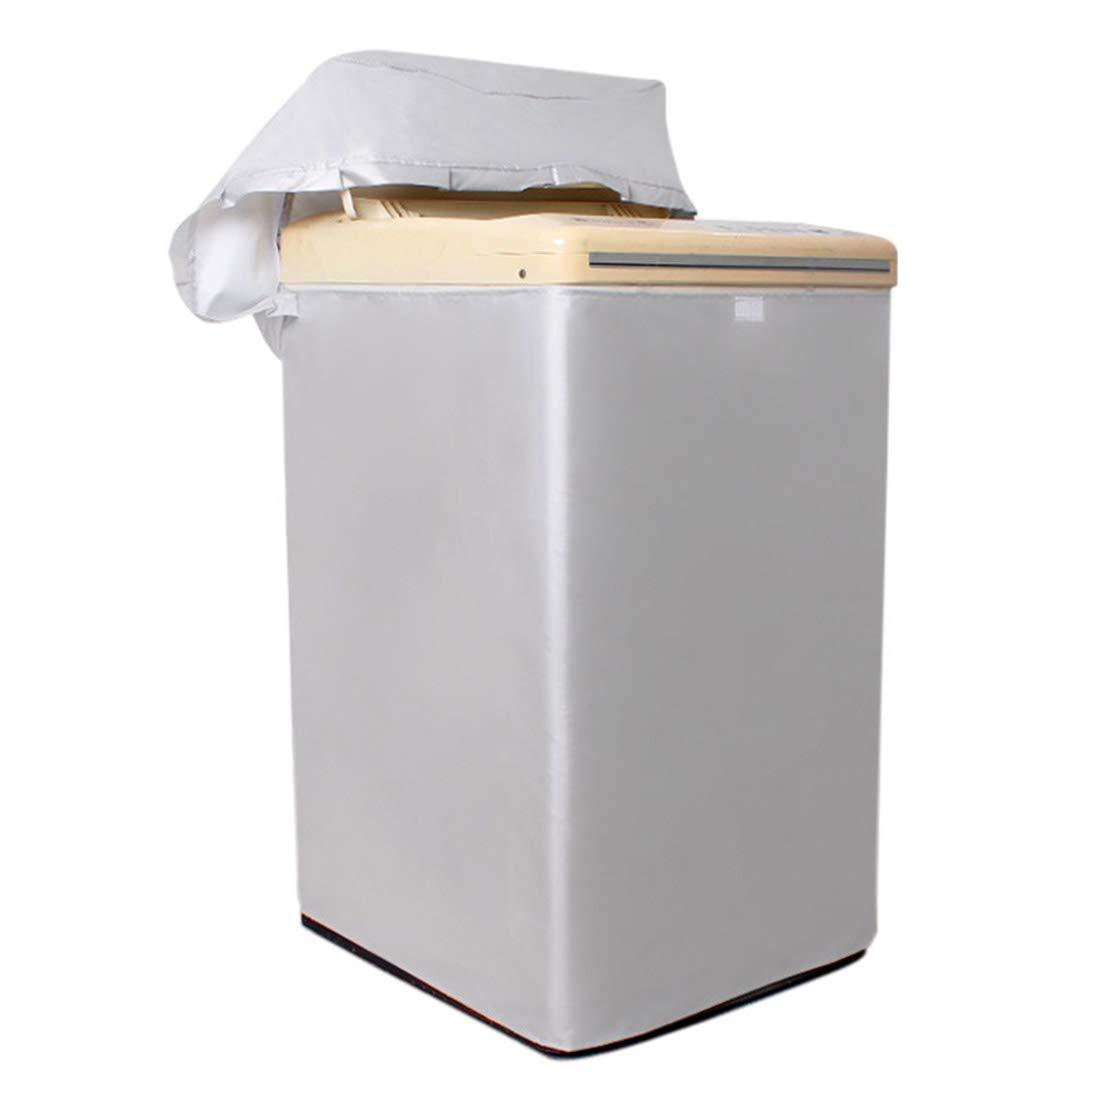 Enerhu Washing Machine Cover 2-way Zipper Waterproof Sunscreen Smoke-proof Protective No Elasticity Silvery Pulsator Washer Dust Cover L(63x61x92cm/24.76x23.97x36.16inch)